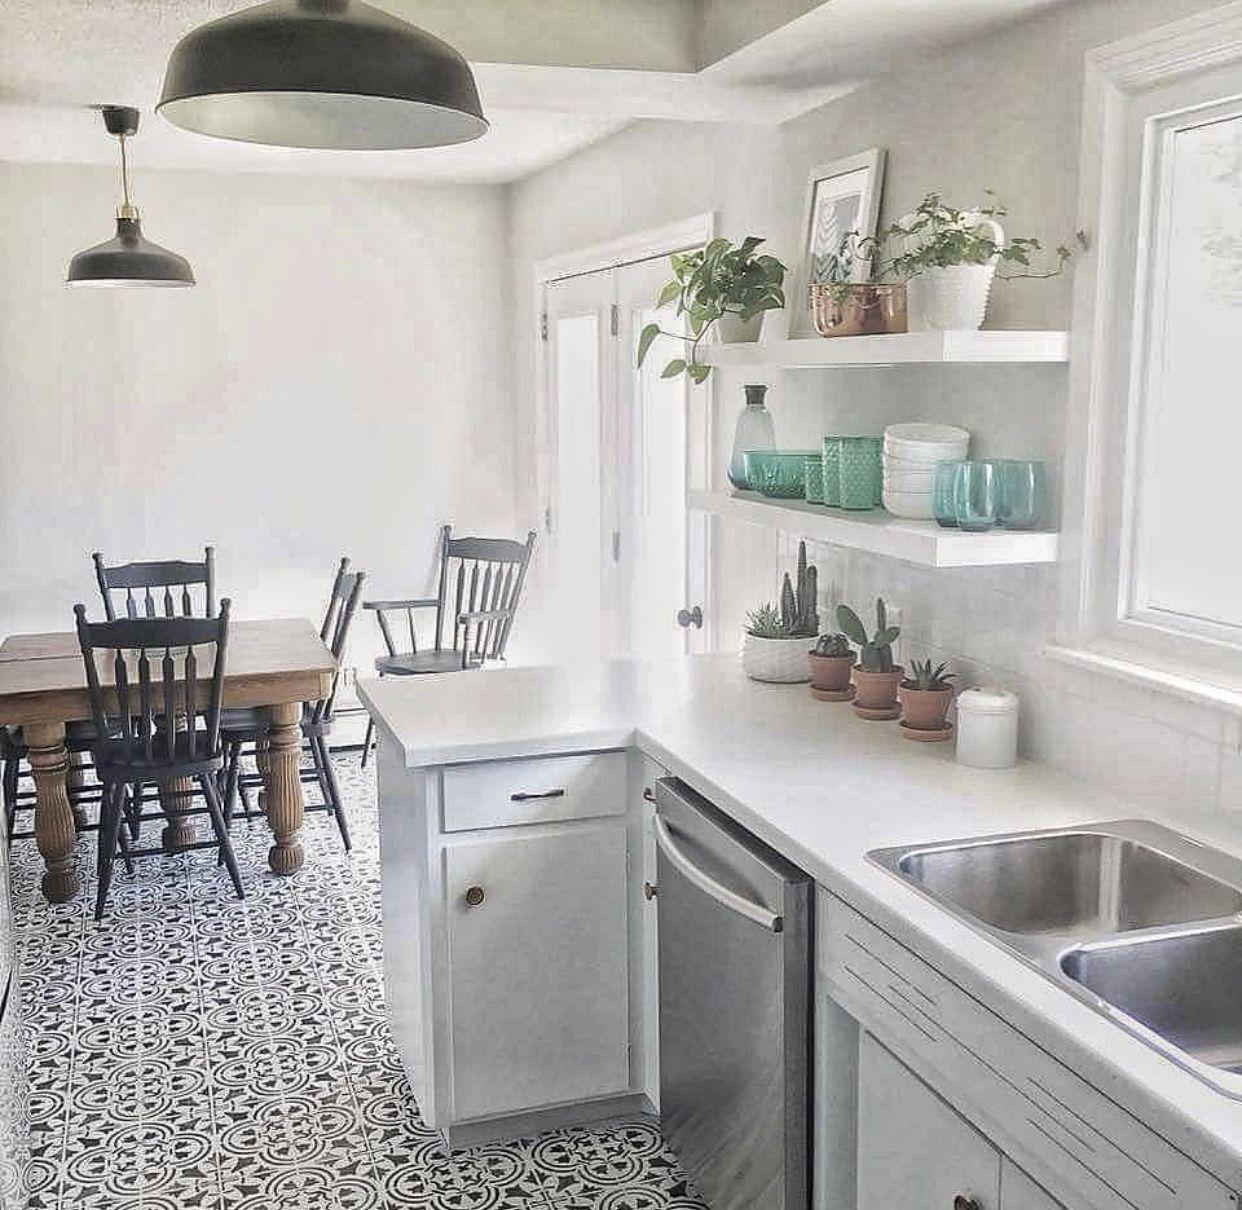 Pin By Jessica Kielty On Kitchen Cottage Kitchen Tiles Kitchen Decor Inspiration Painting Kitchen Cabinets